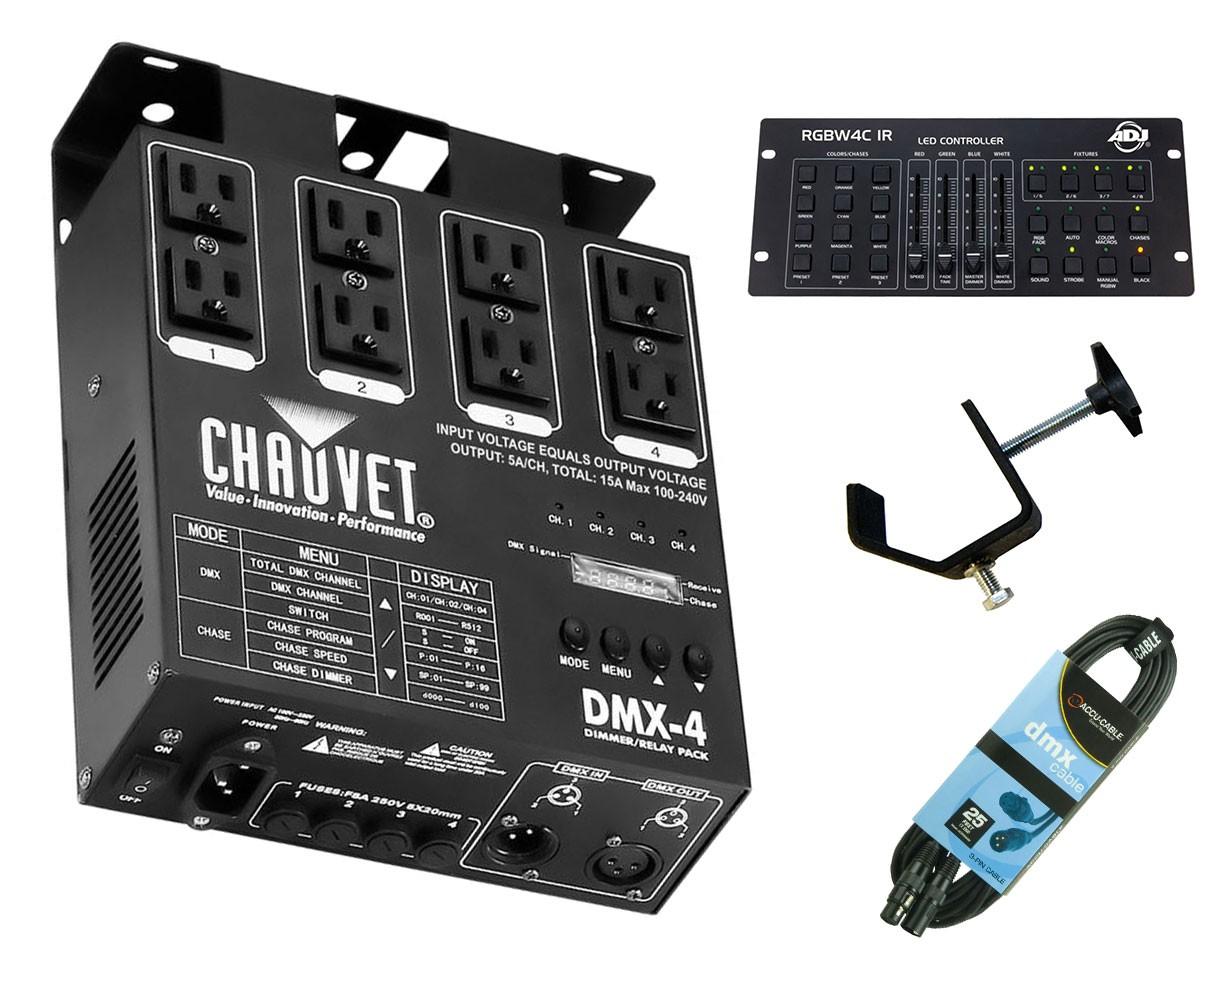 CHAUVET DJ DMX-4 + RGBW4C IR + Clamp + Cable